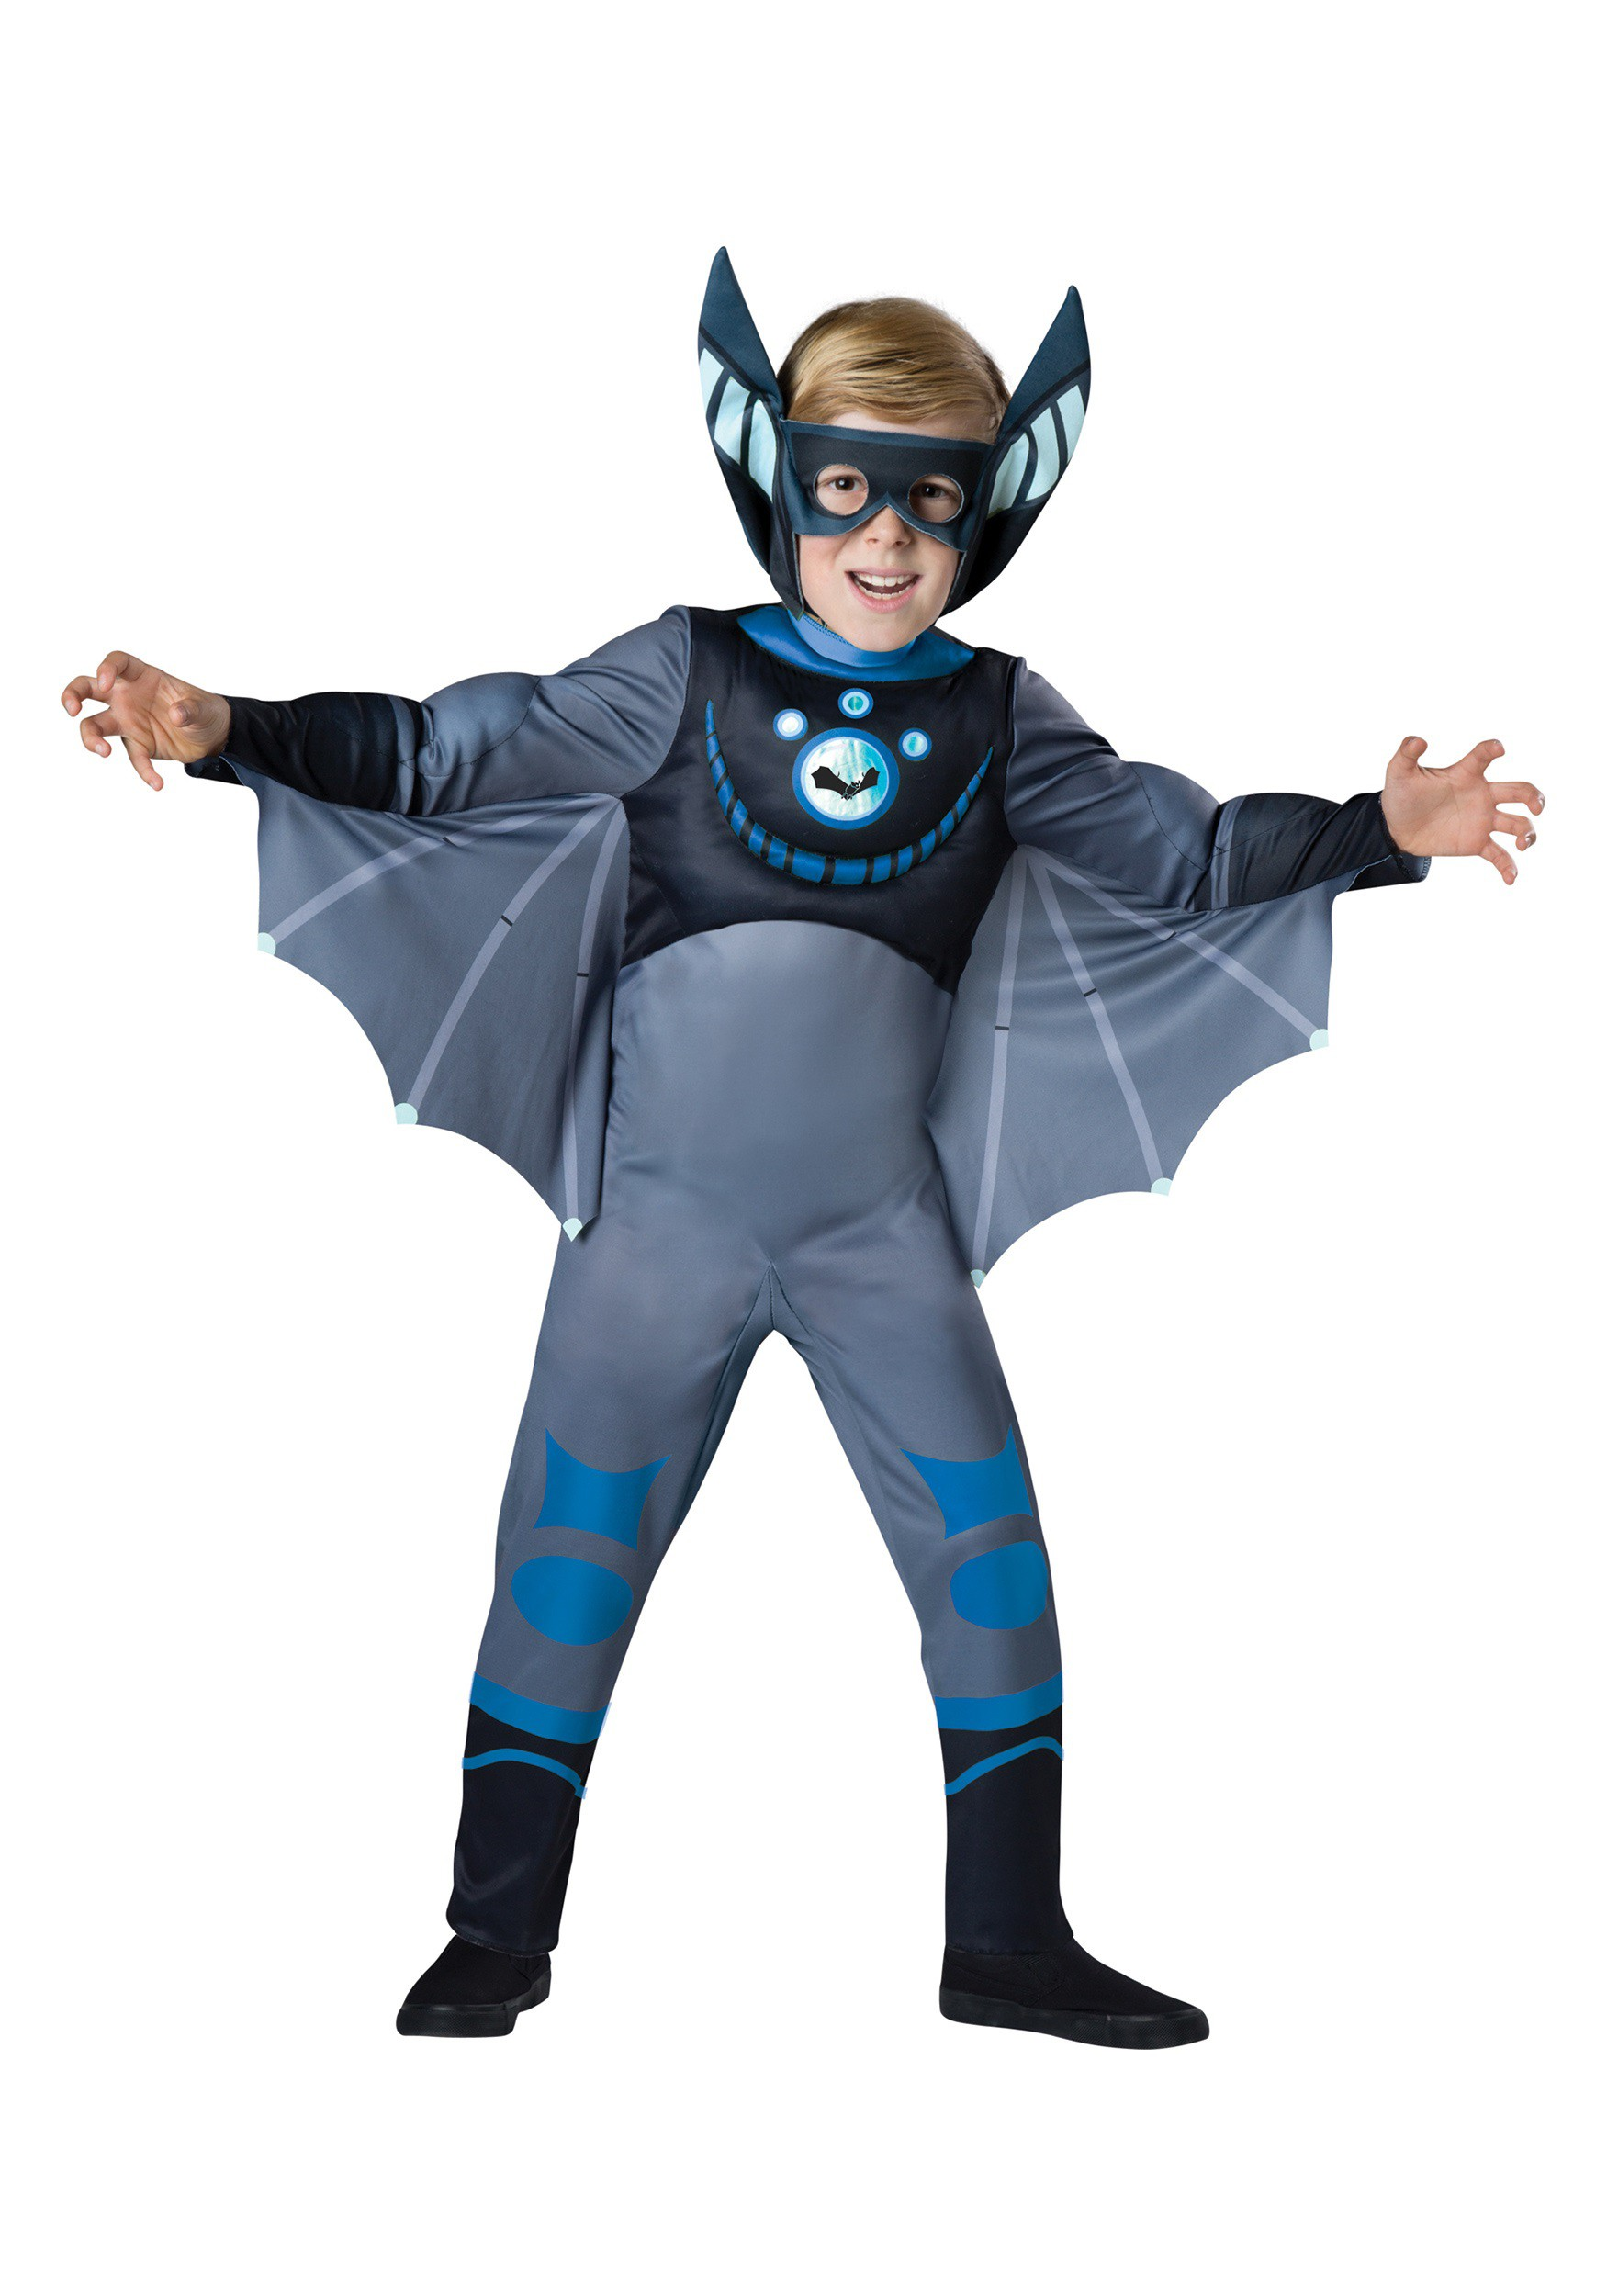 Toddler Bat Halloween Costume